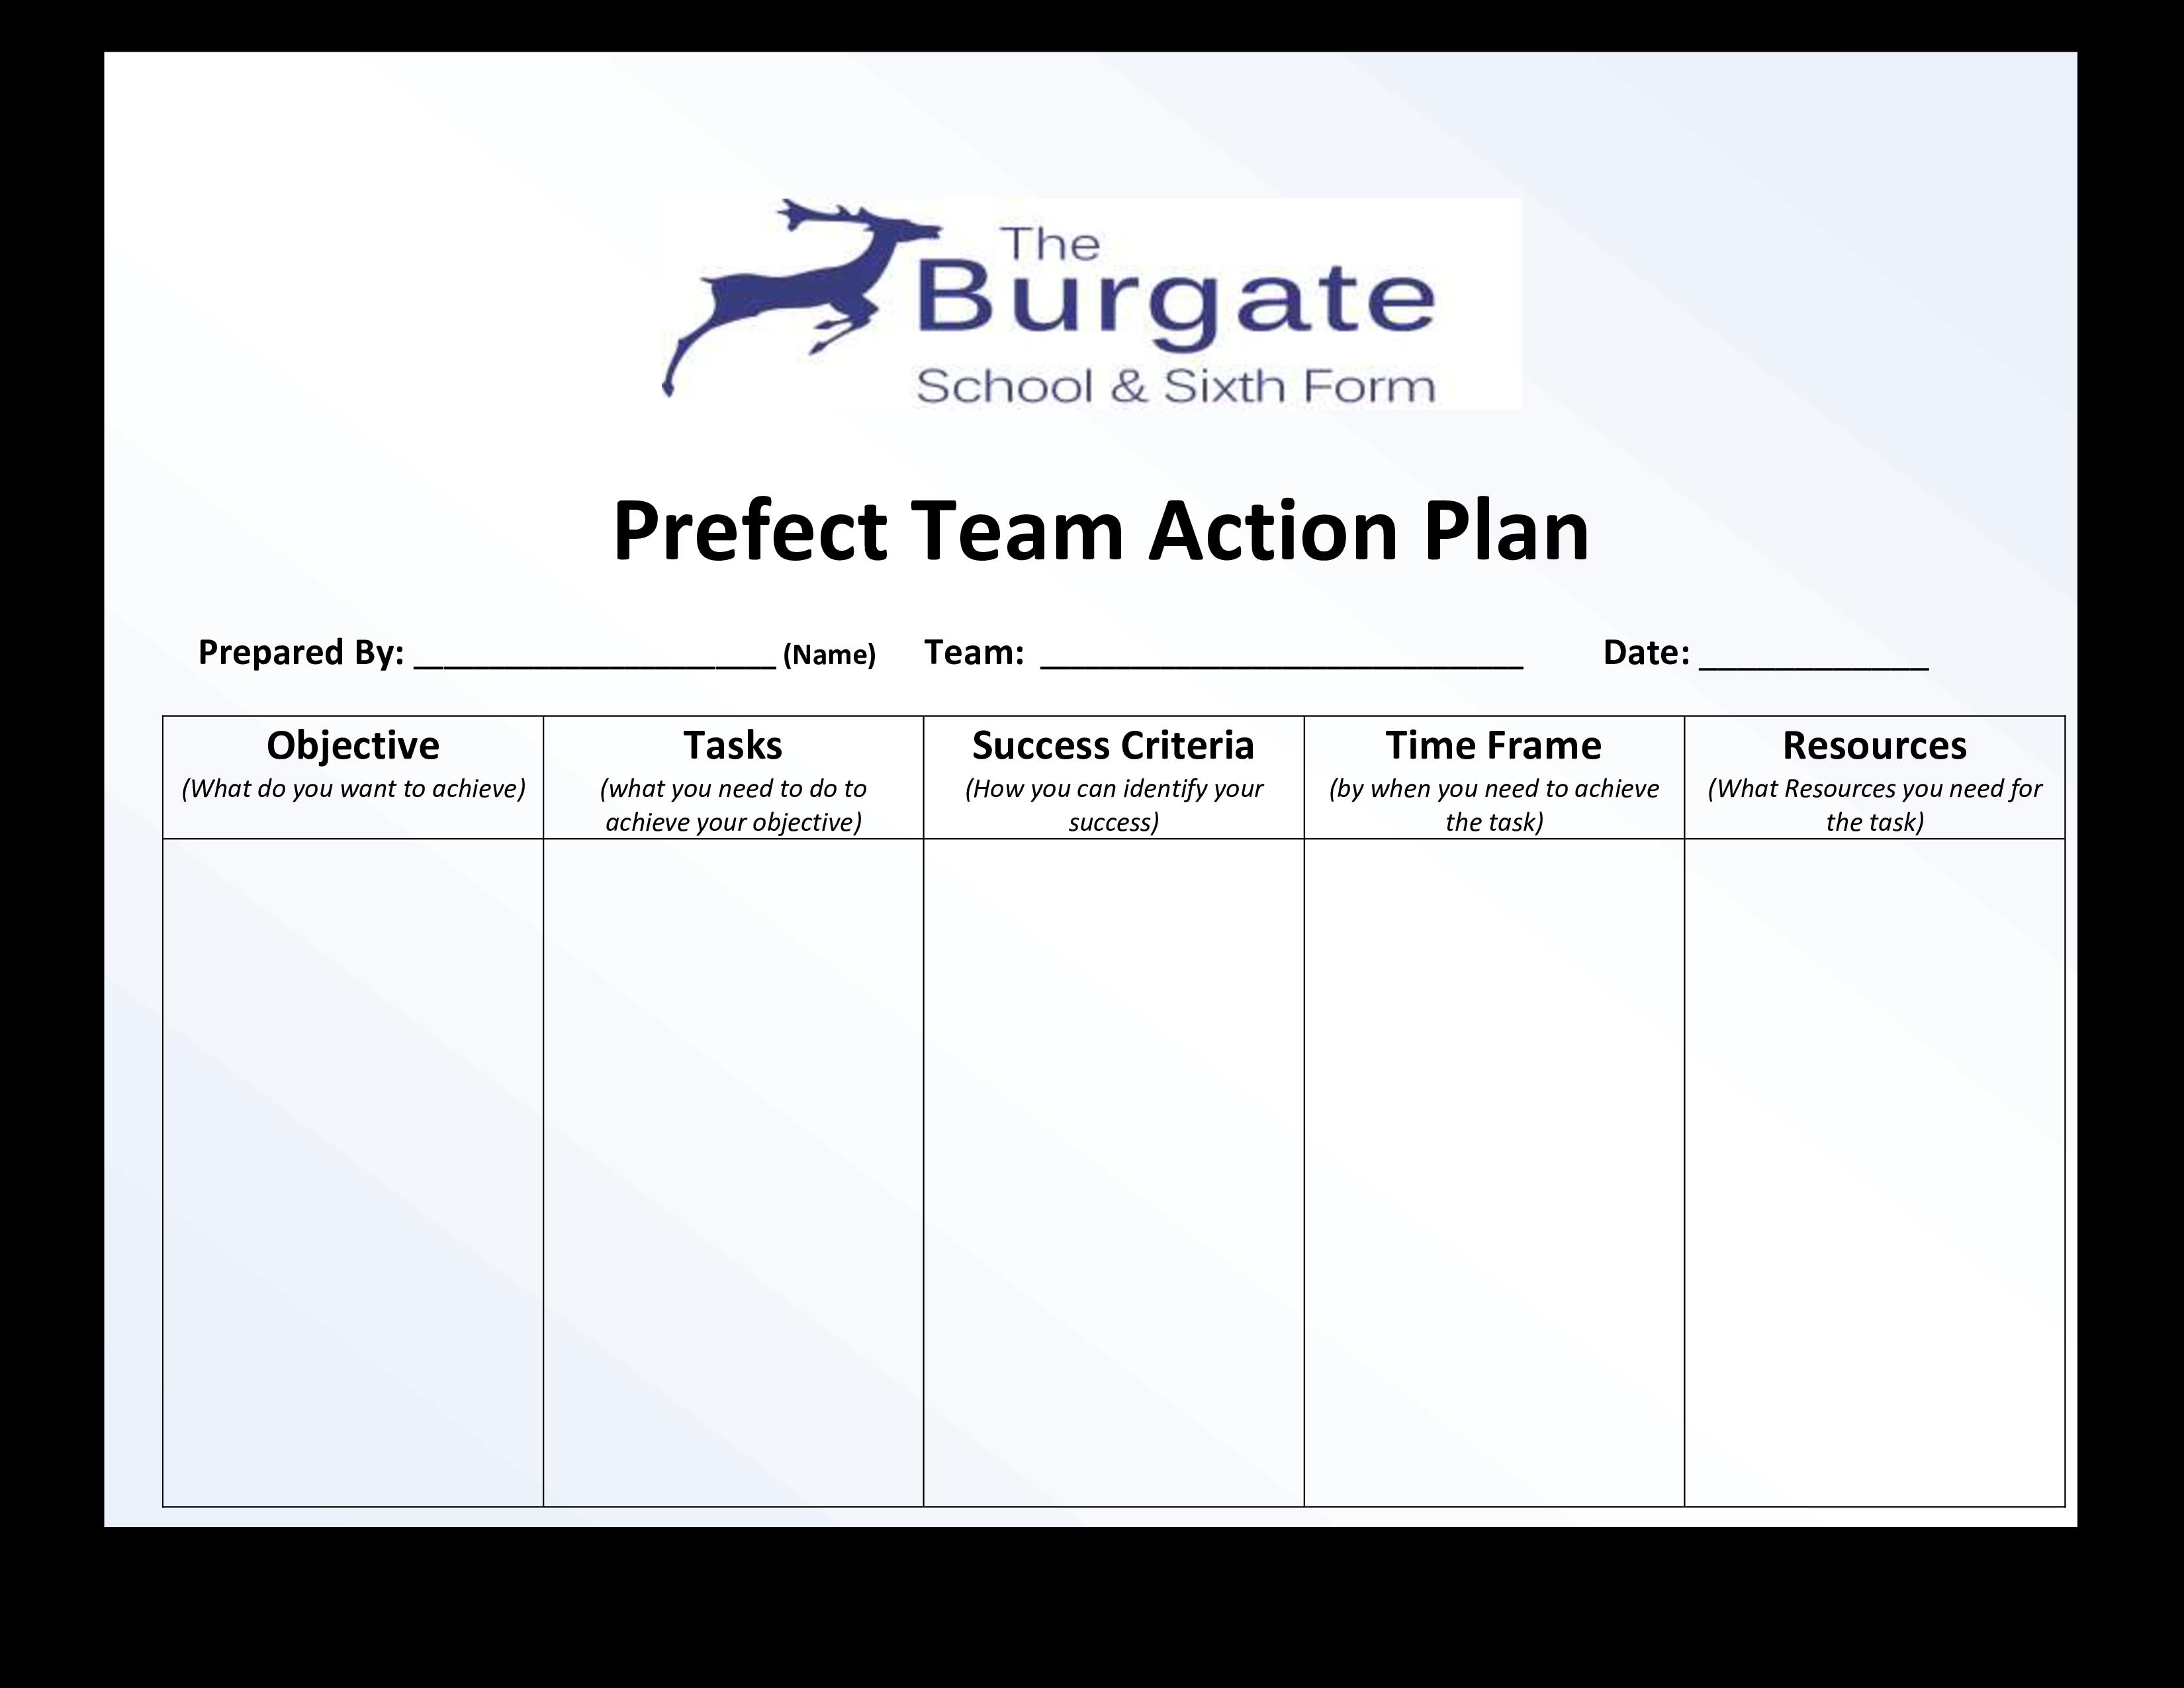 Perfect Team Action Plan Templates At Allbusinesstemplates Com